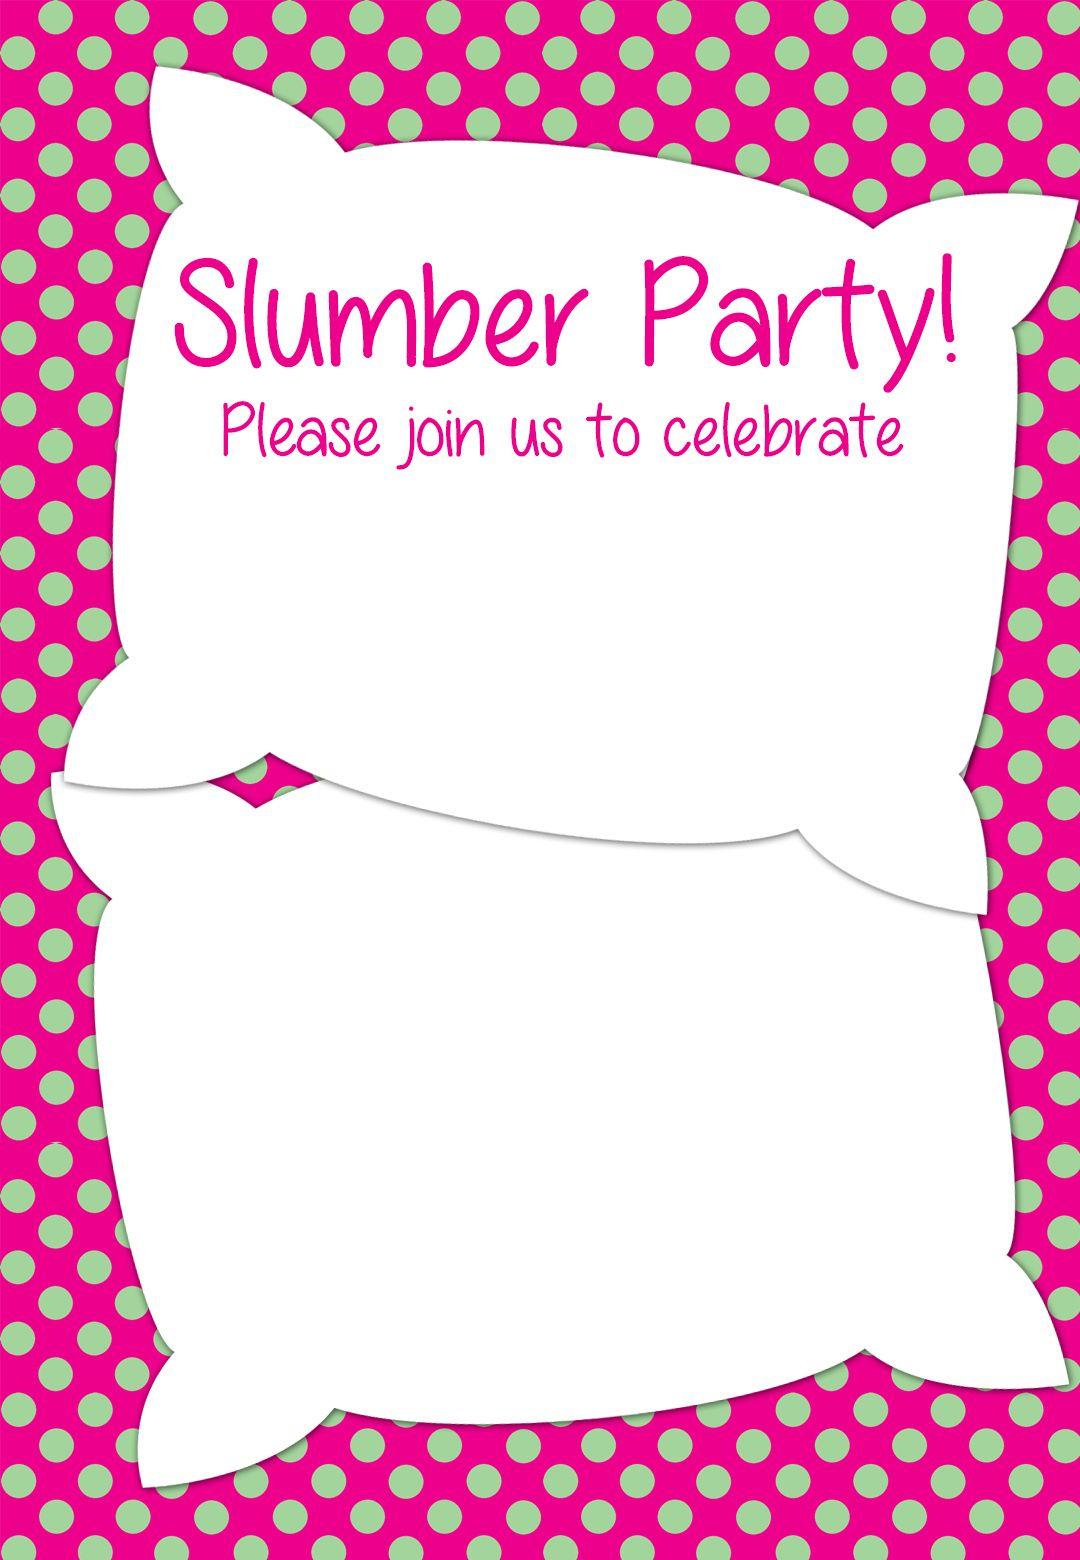 Free Printable Slumber Party Invitation | Party Ideas In 2019 - Free Printable Event Invitations